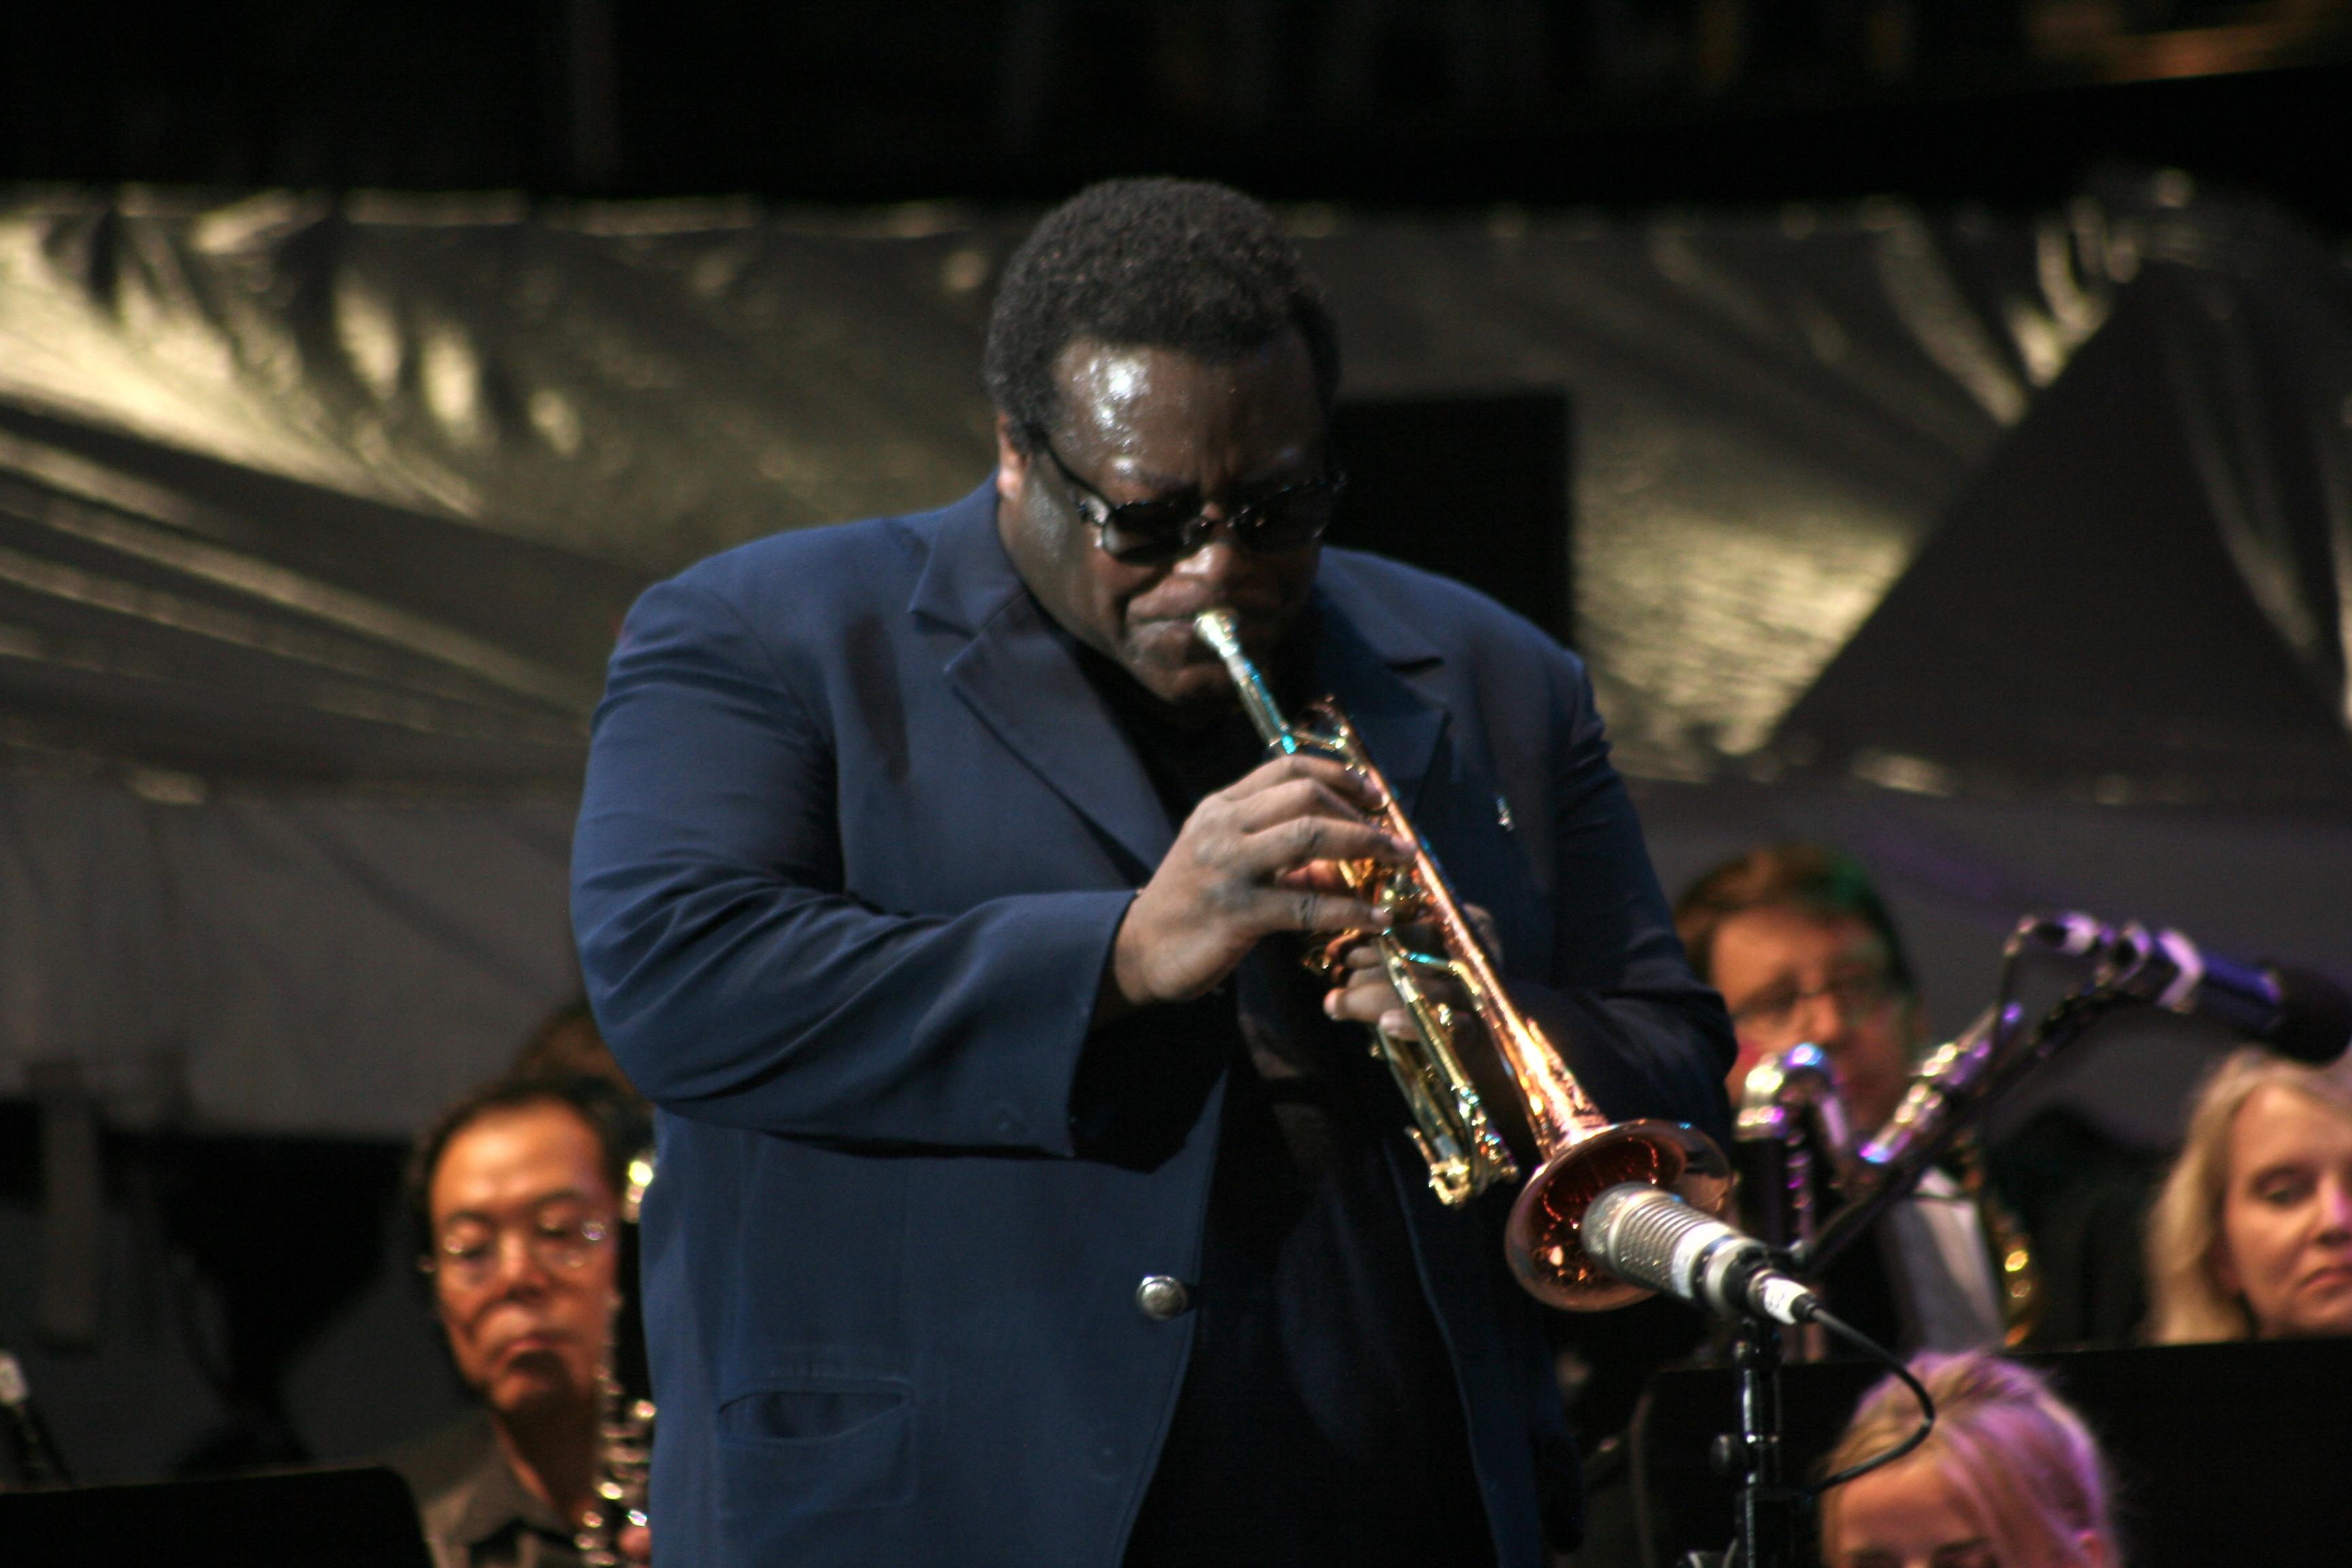 Wallace Roney @ 2014 Detroit Jazzfest